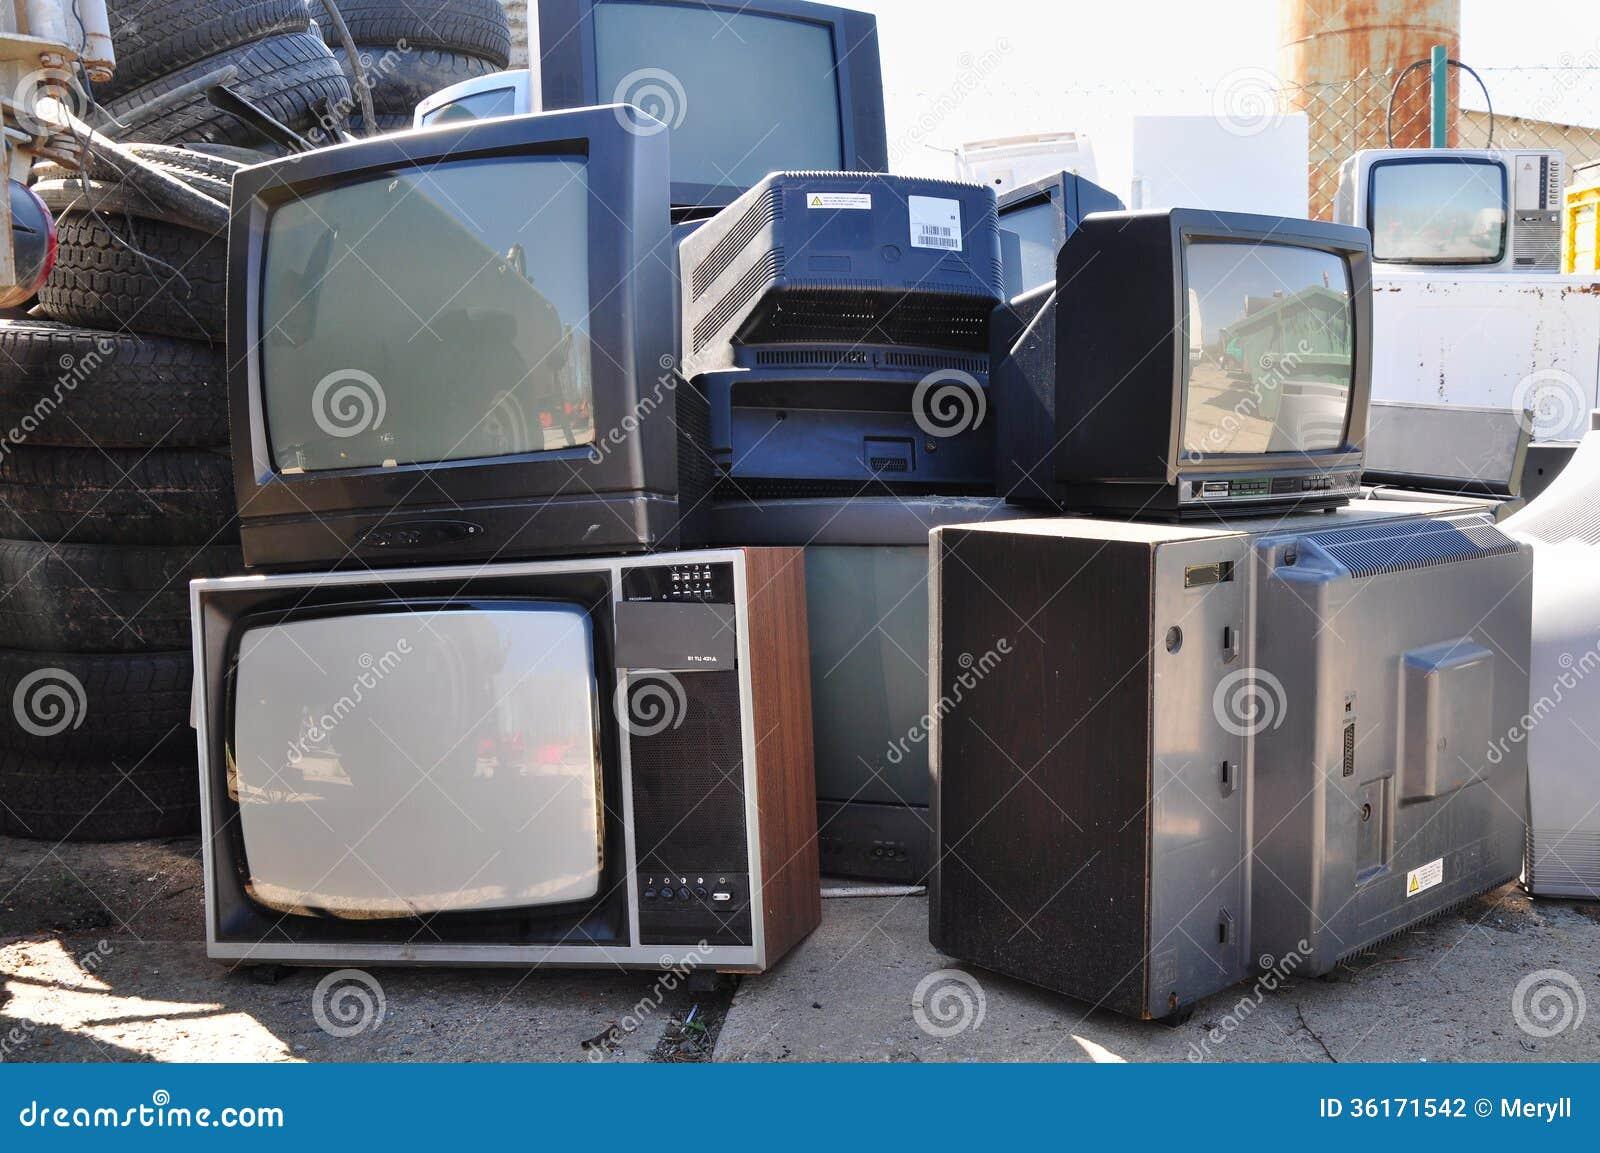 essay on e waste best e waste images slb etude d avocats